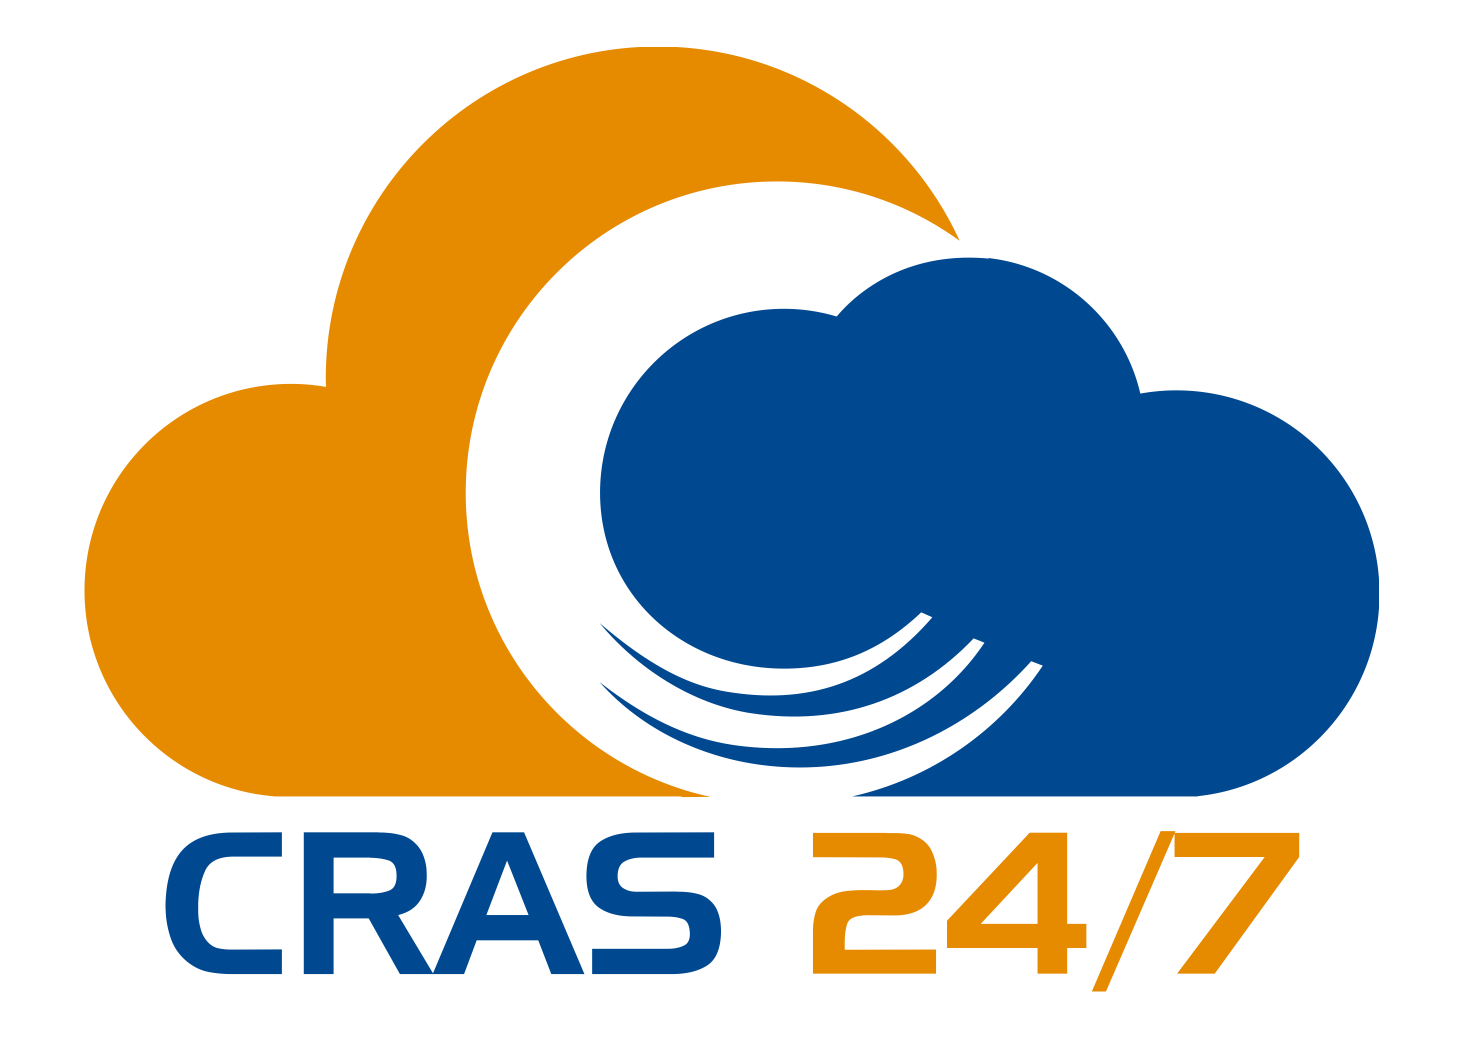 CRAS247